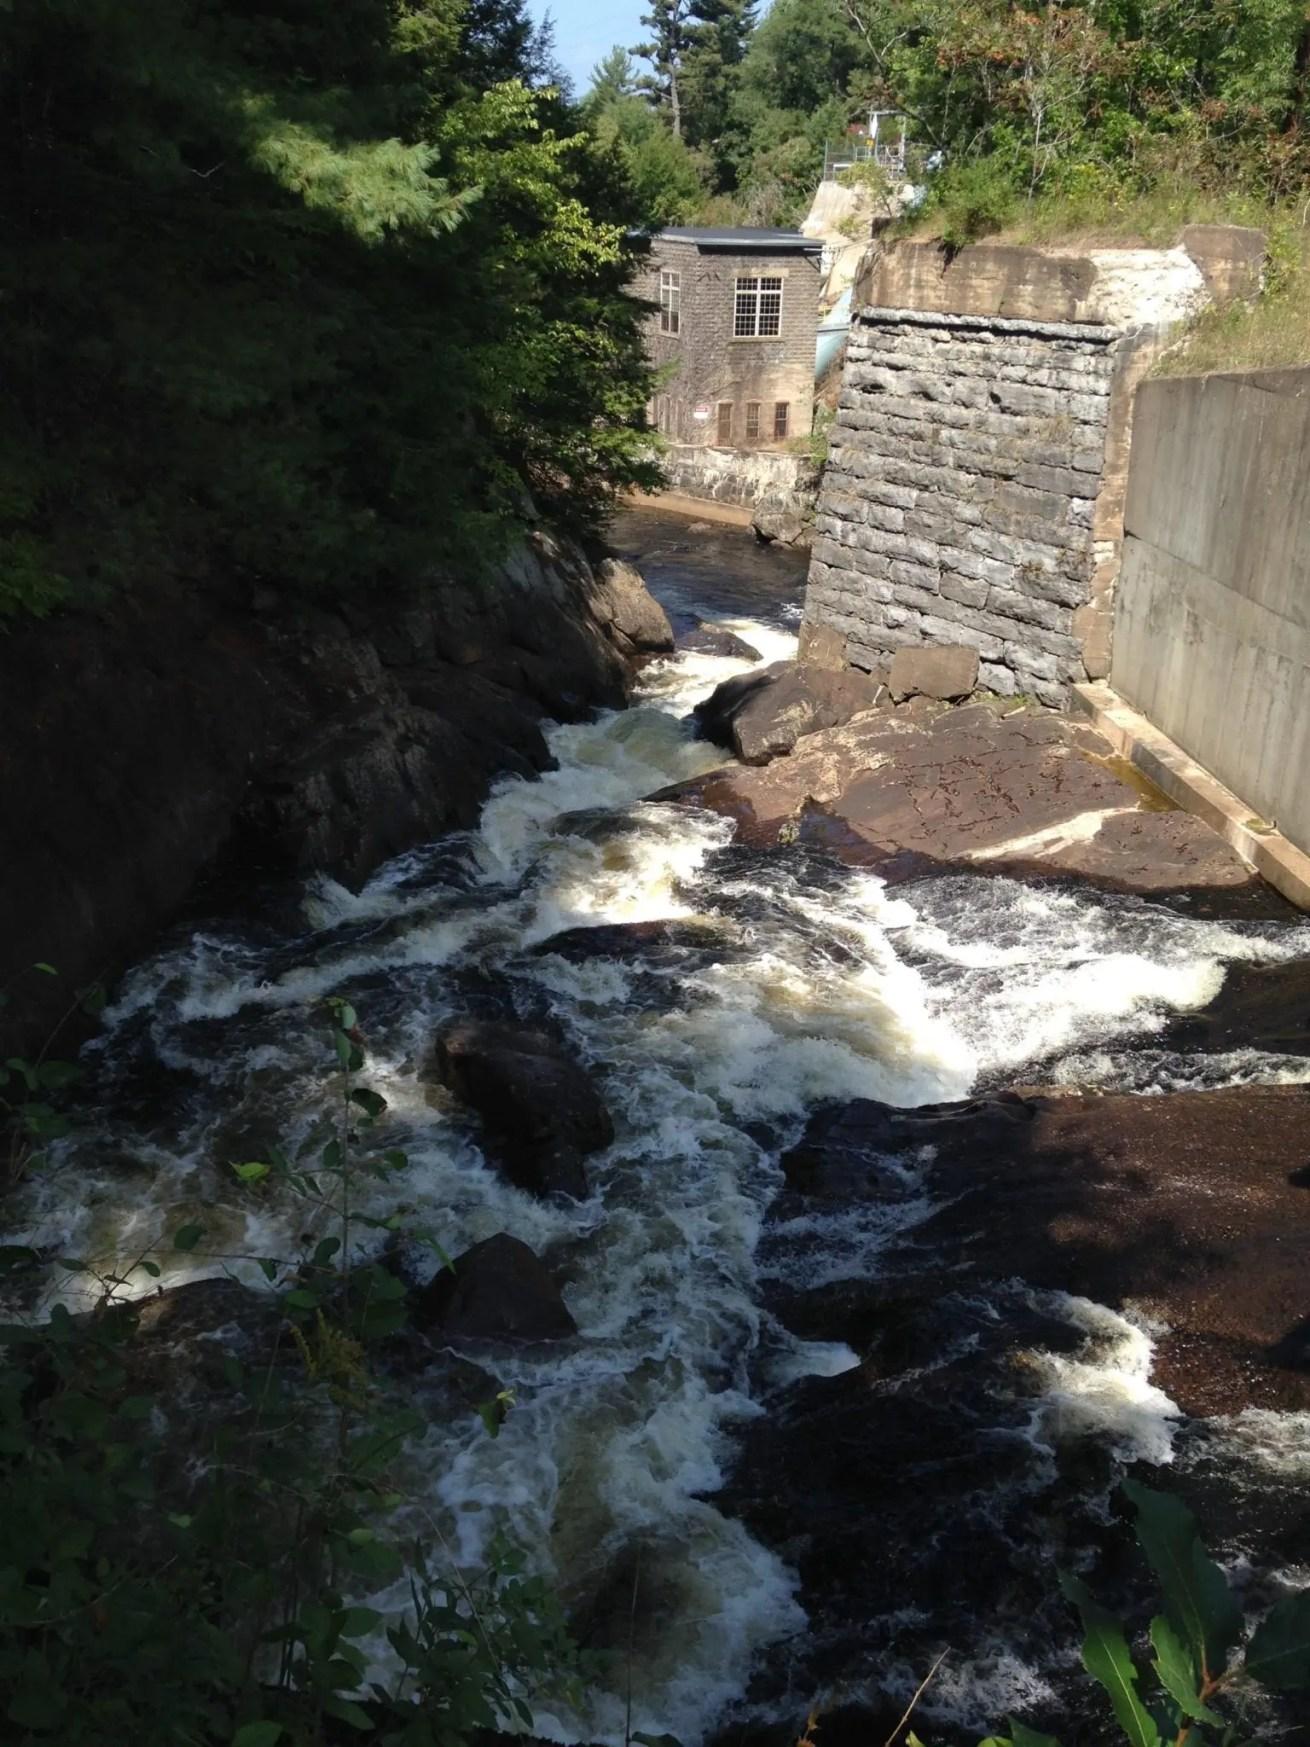 Belfort Dam and Falls, Croghan Twn, Lewis County, New York